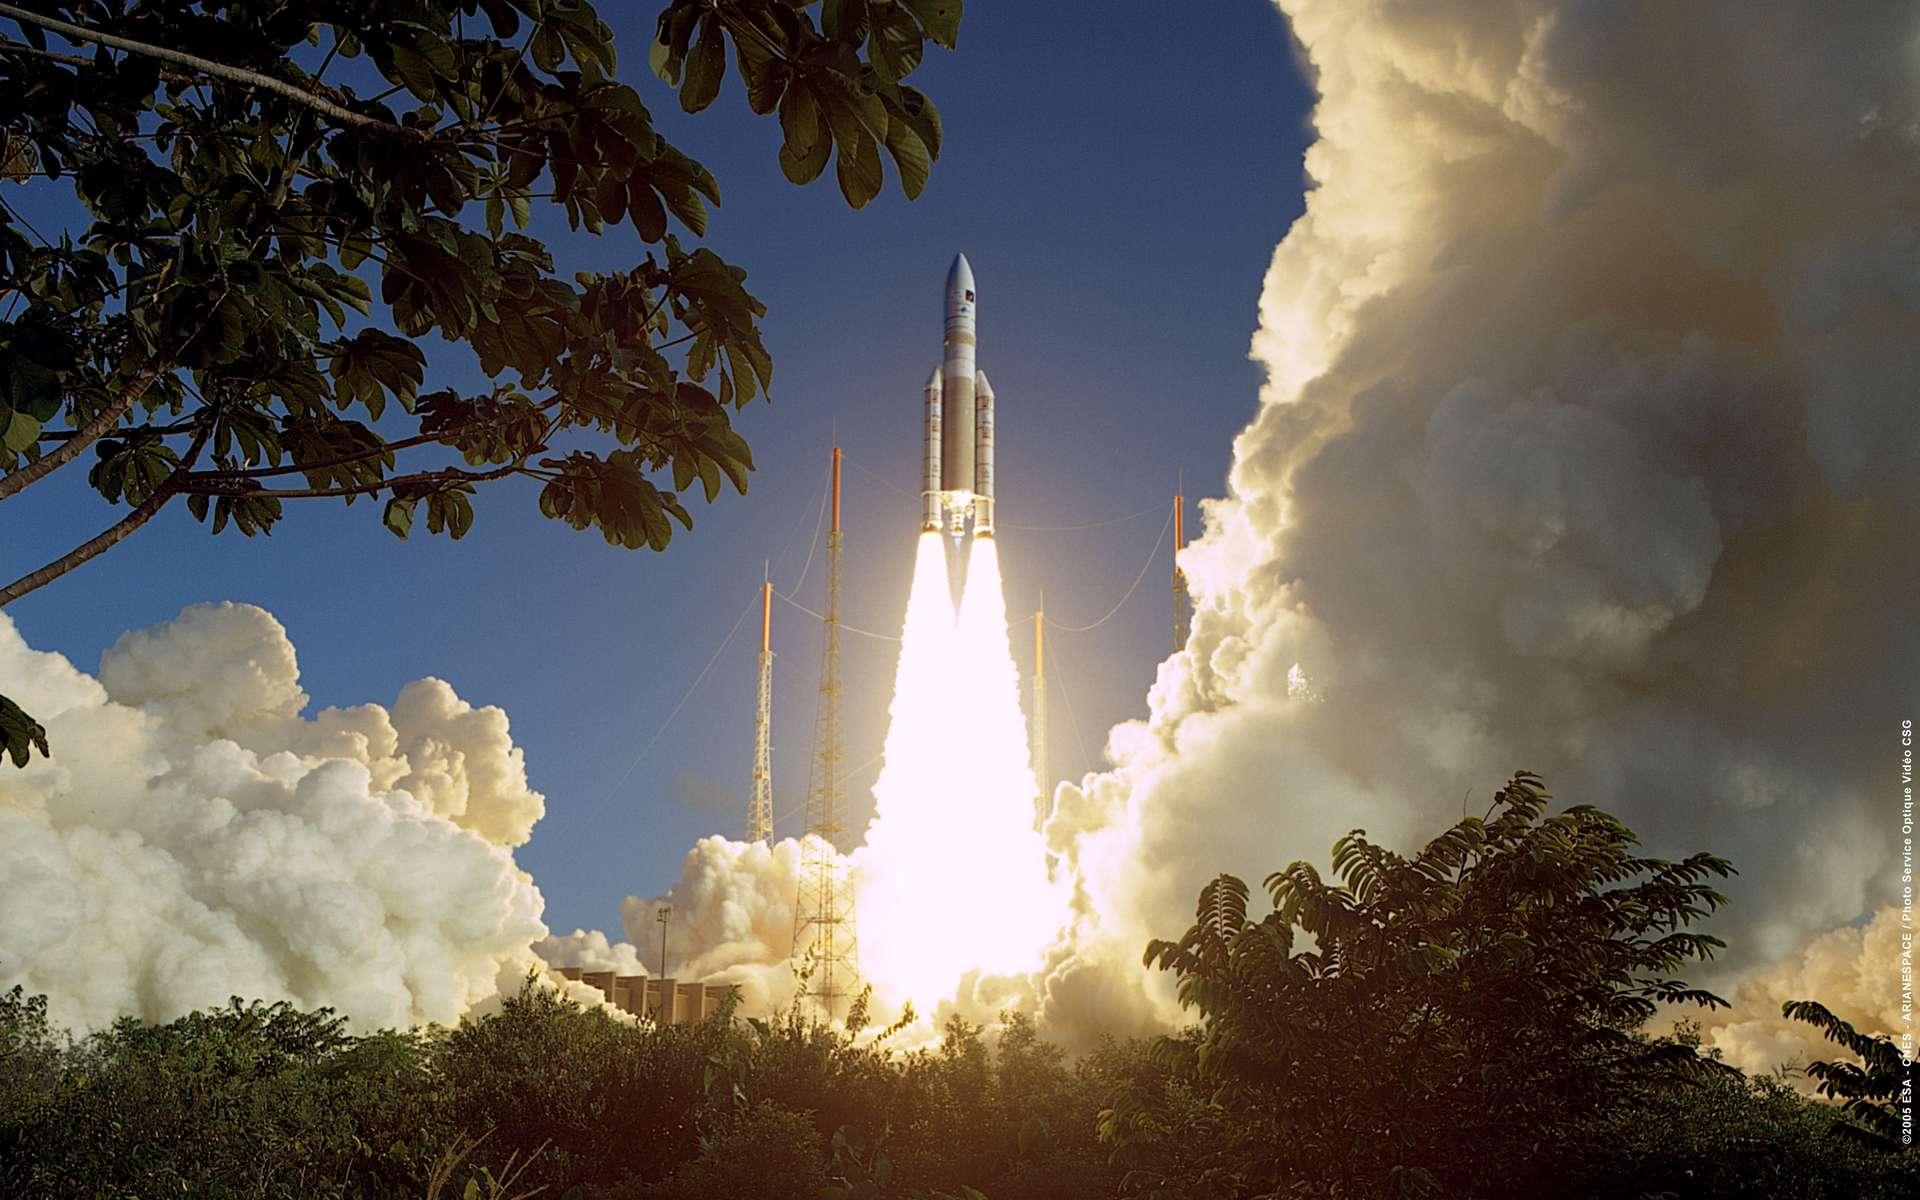 Lancement Ariane 5 à Kourou. ©ESA